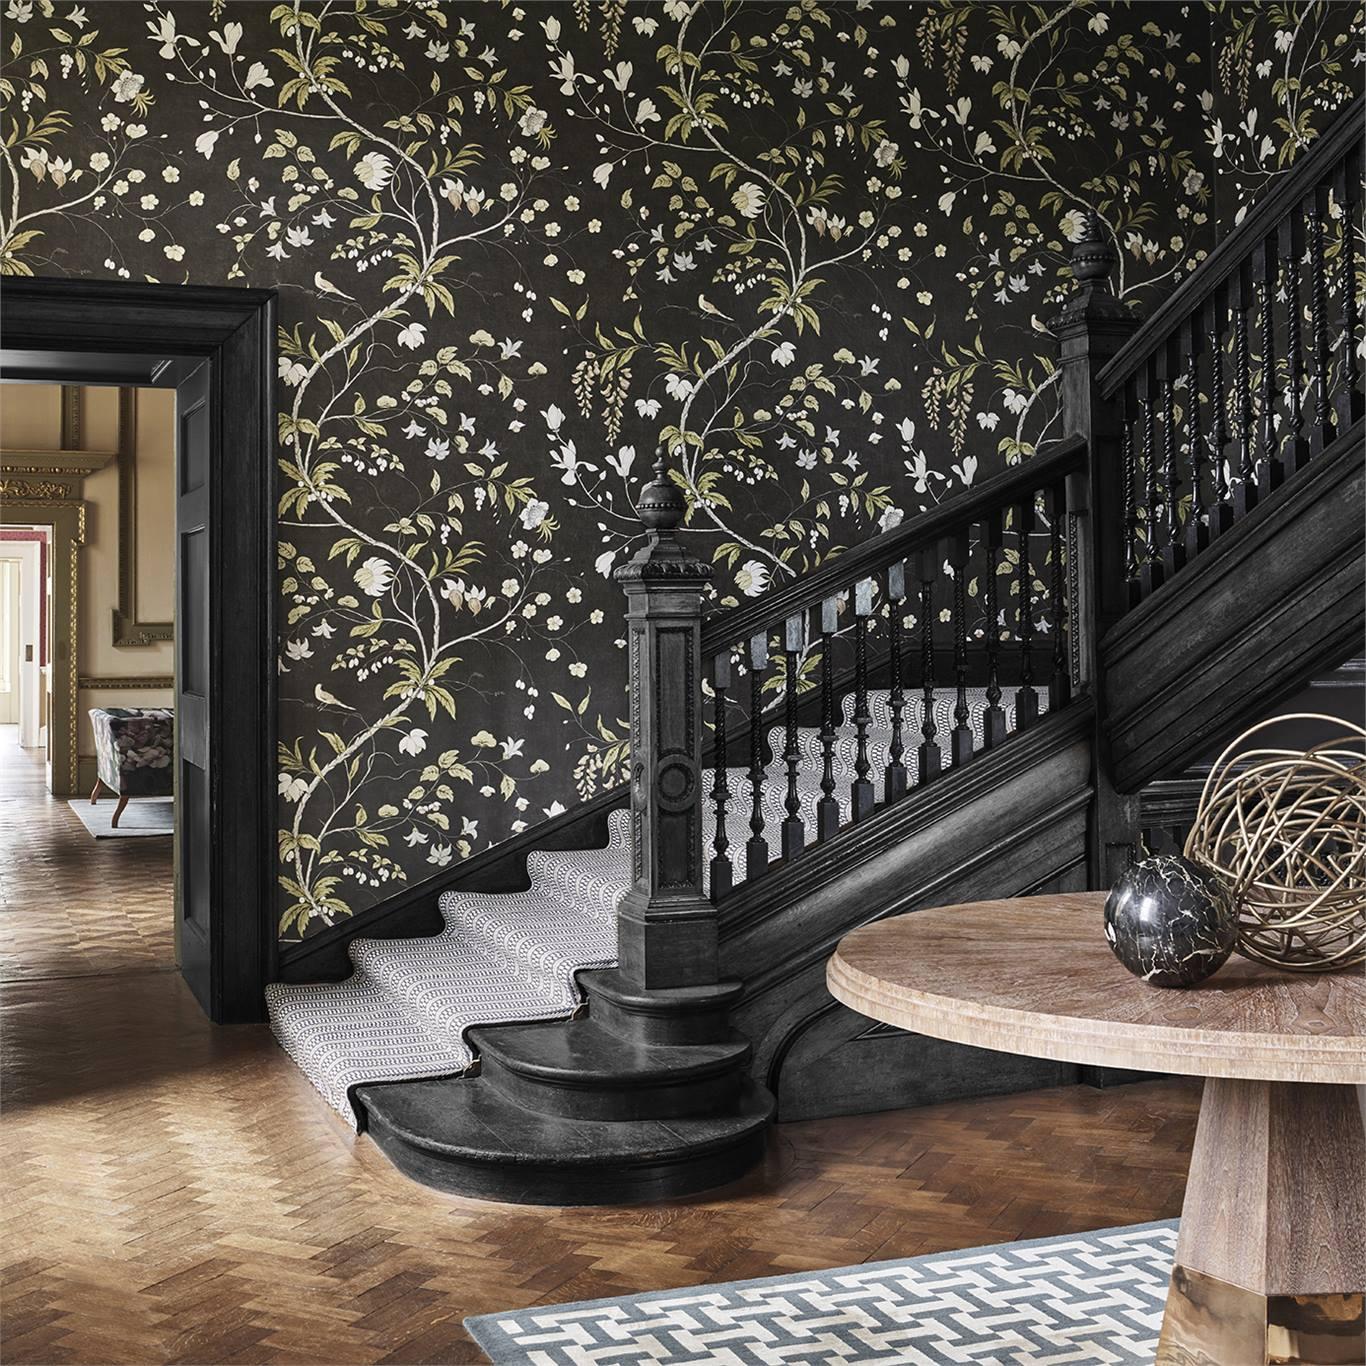 Willow Bloom Home Chambalon Antique Gold:Vine Black Wallpaper